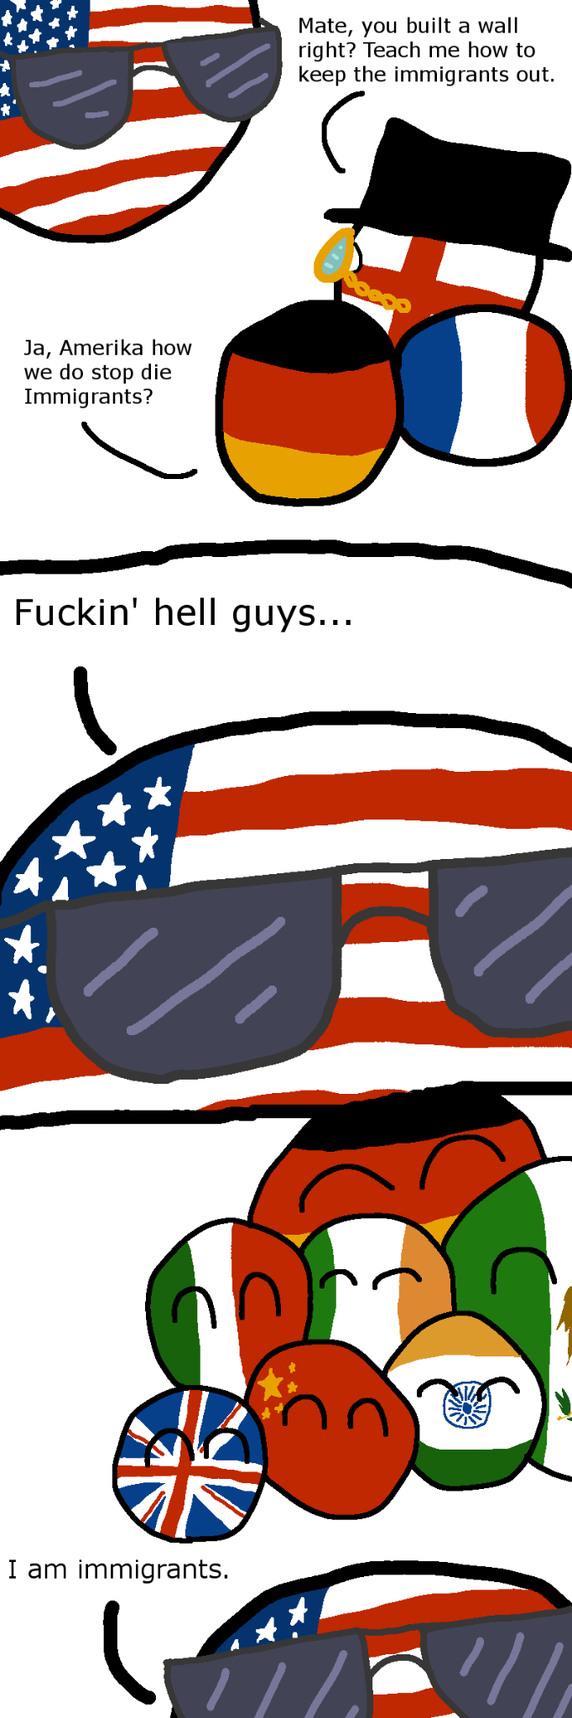 Immigration solutions - meme